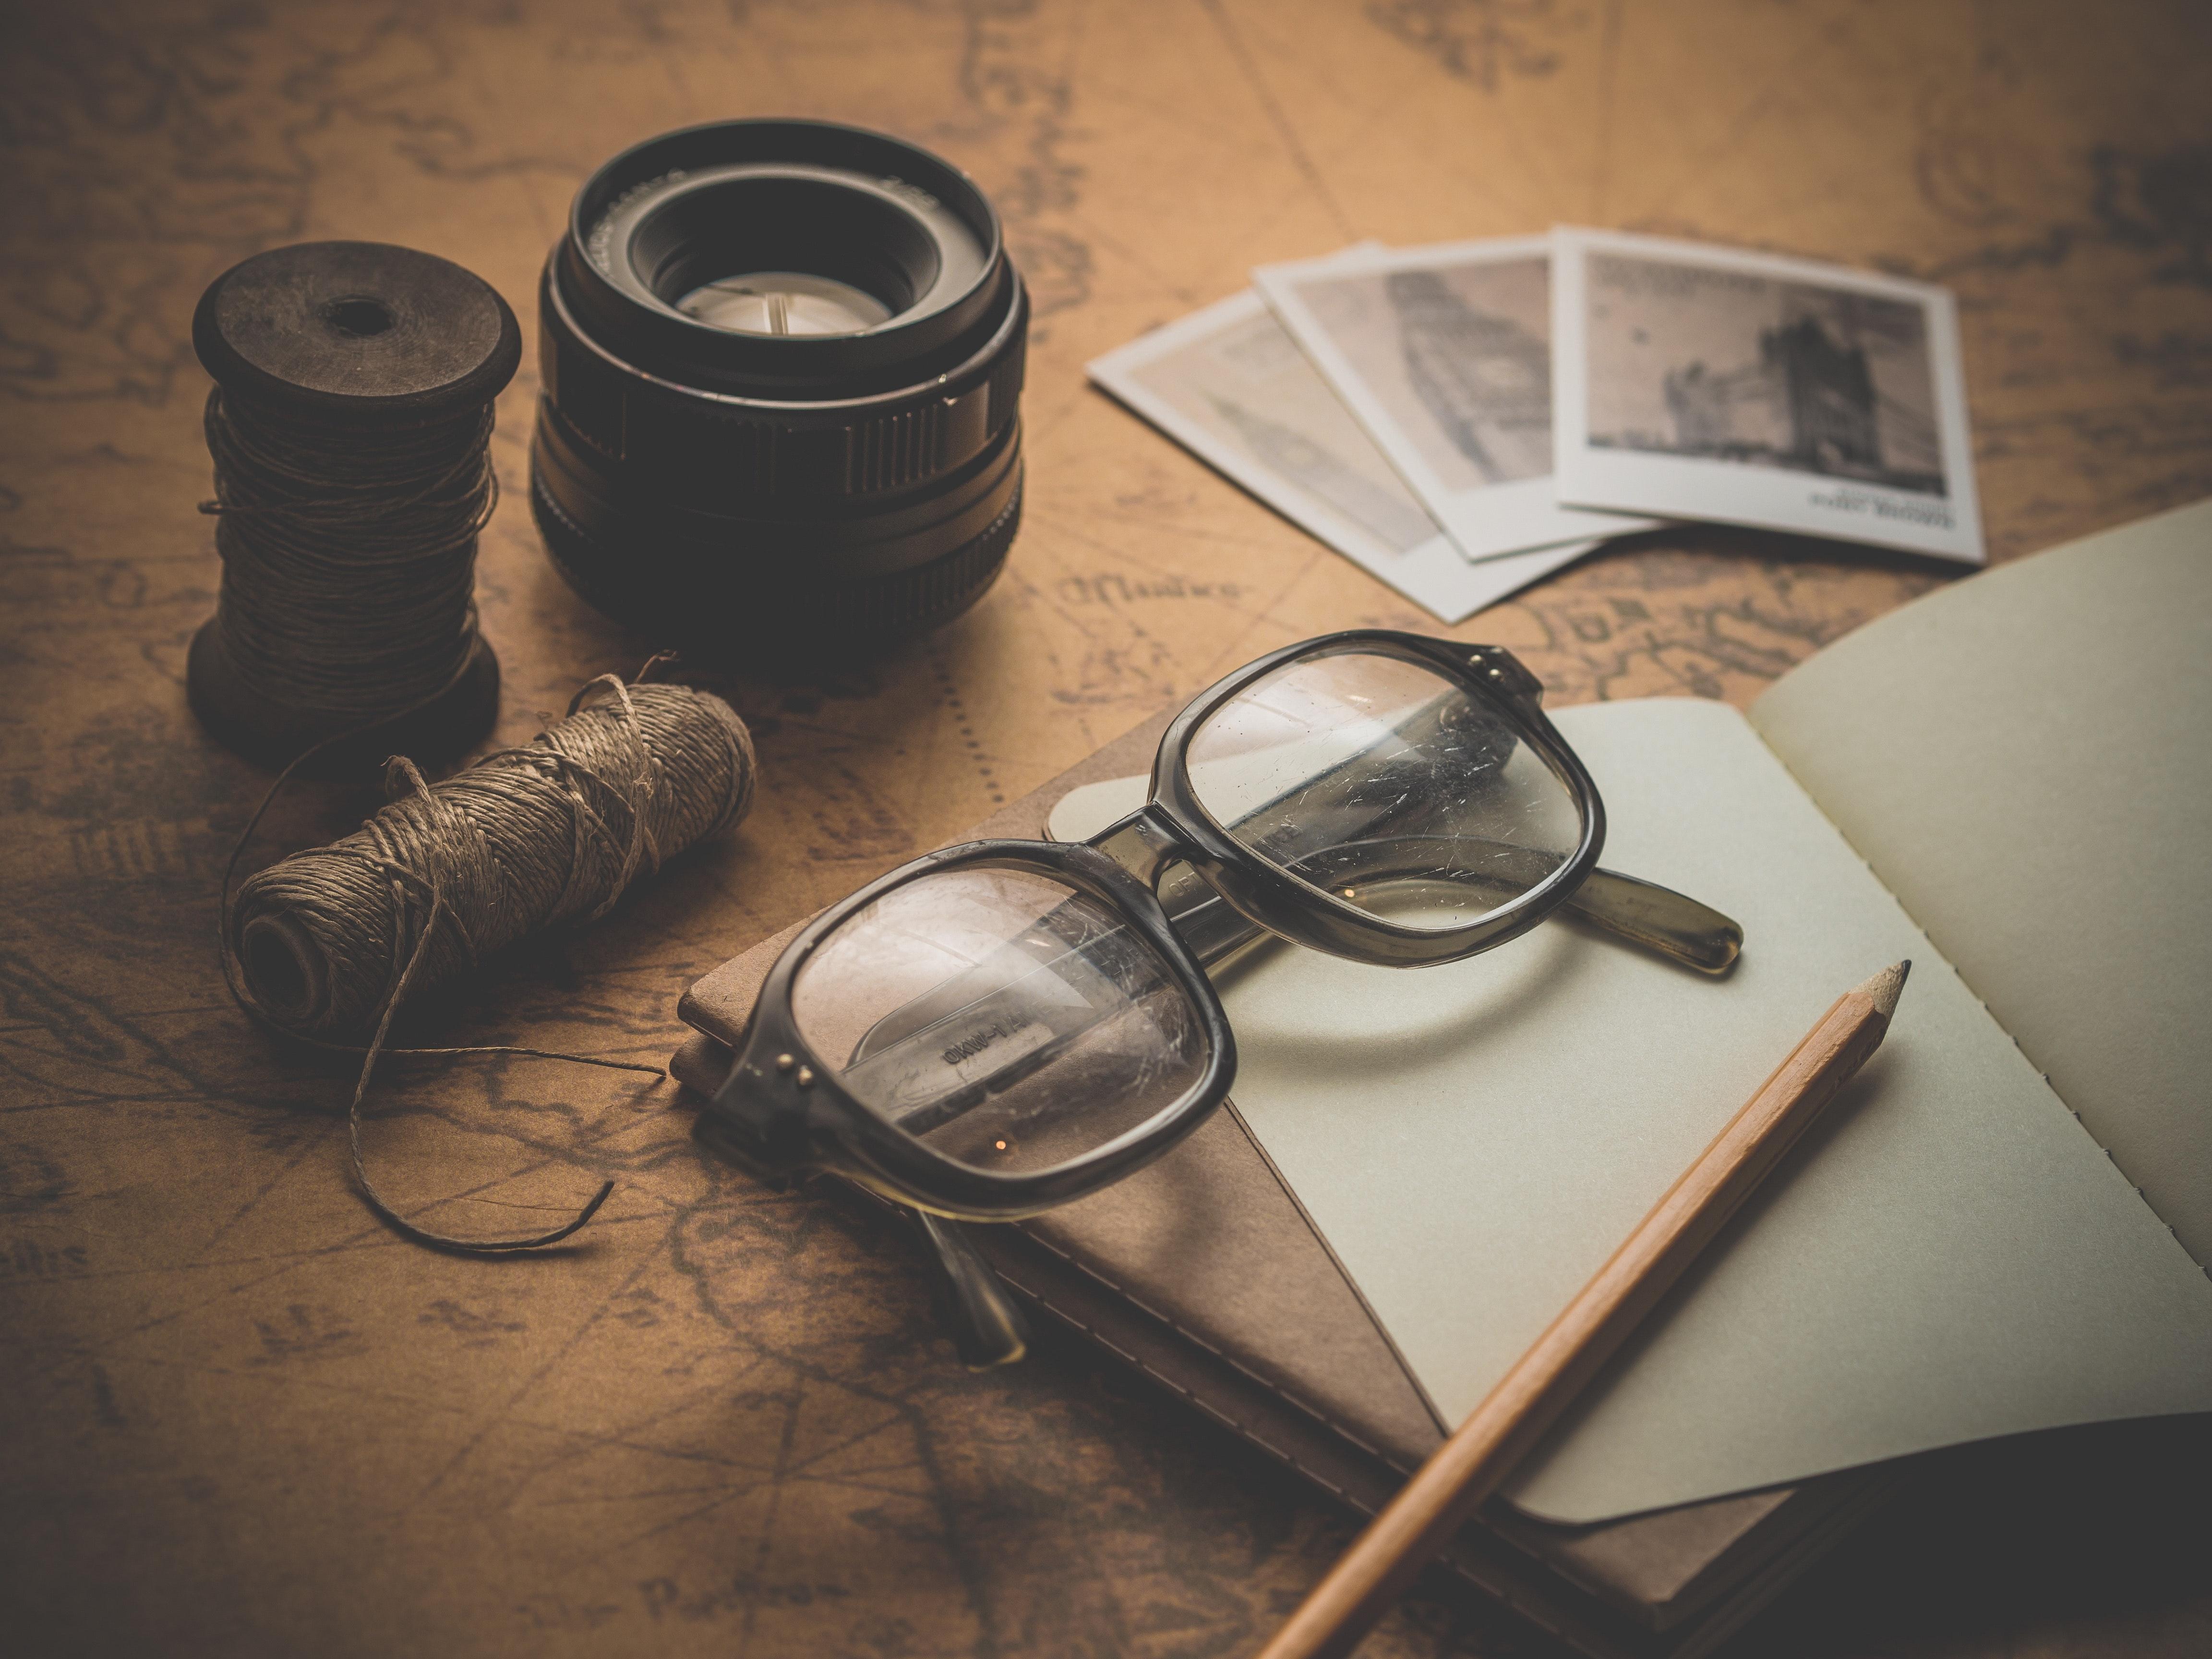 071c3bd8d9 Free photo  Black Framed Eyeglasses Near Graphing Paper Spiral ...